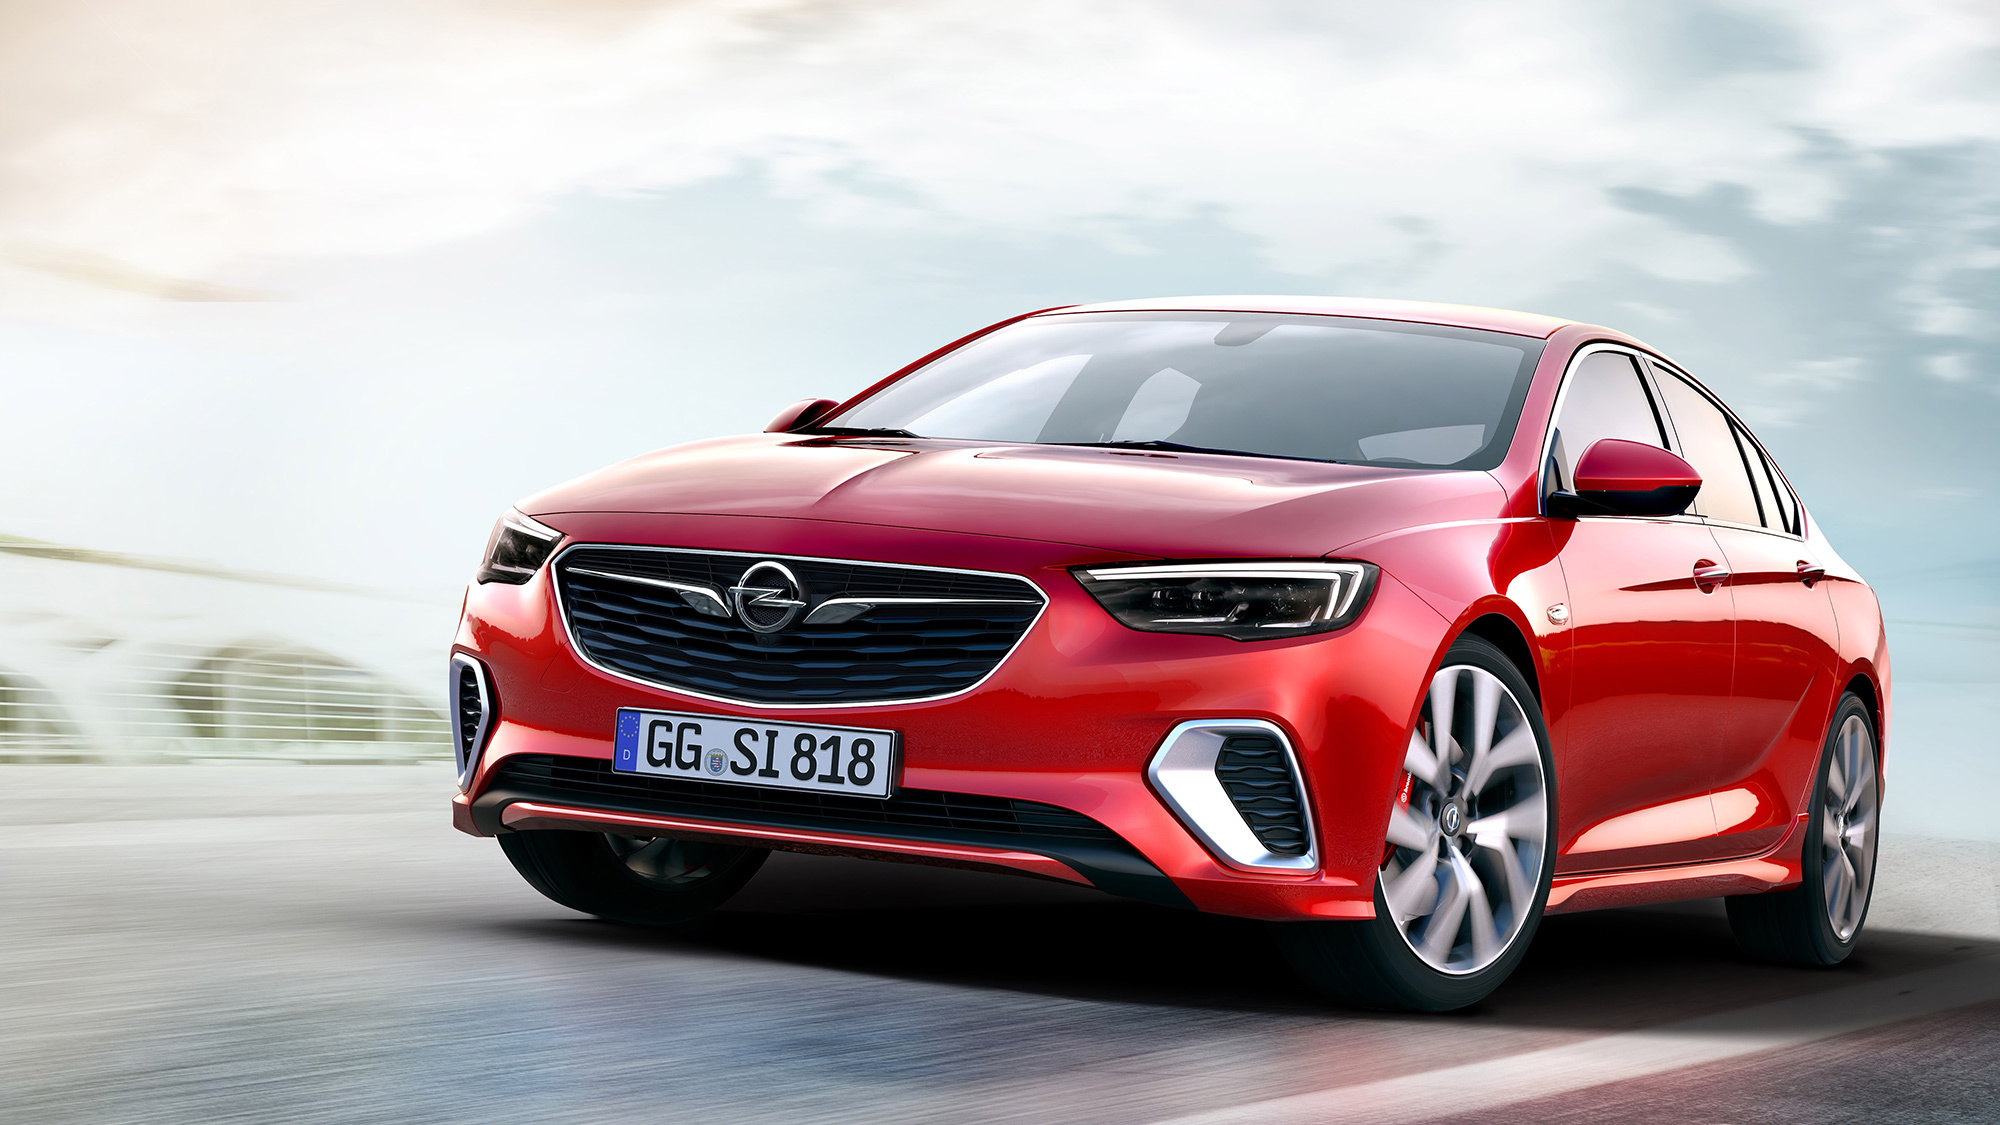 Opel Insignia GSi Wallpapers